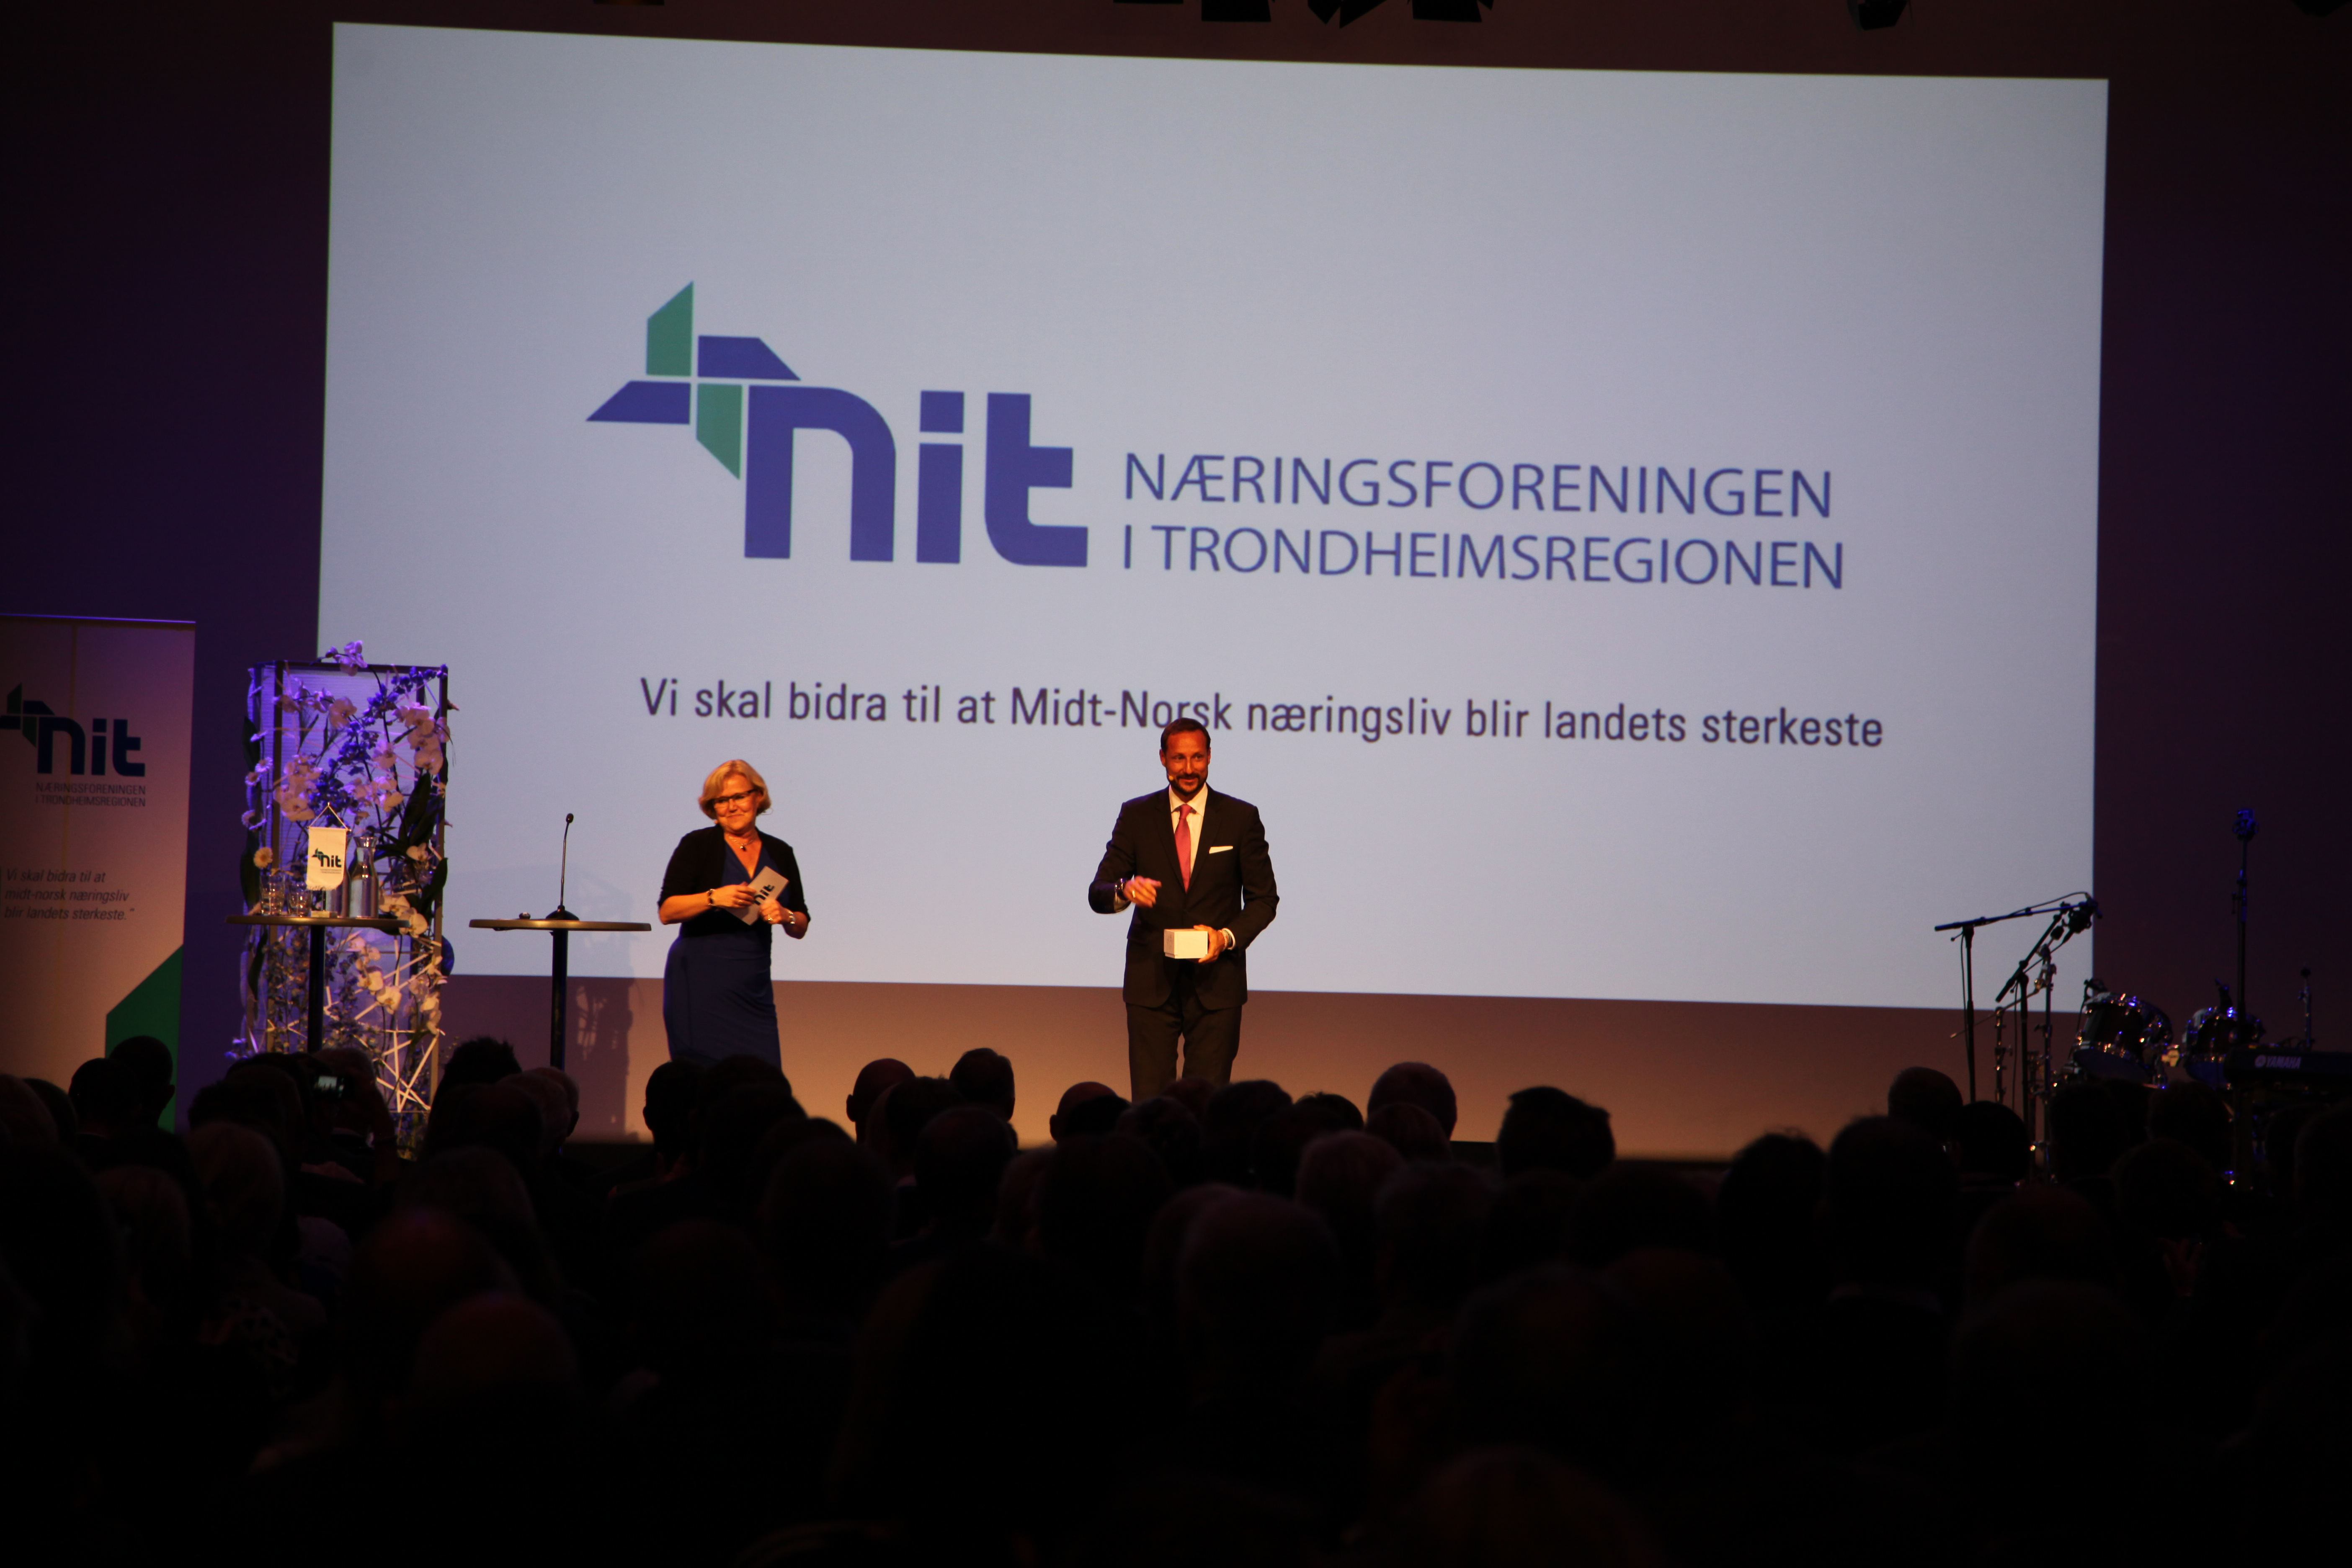 norske beste eventyr fra telemark